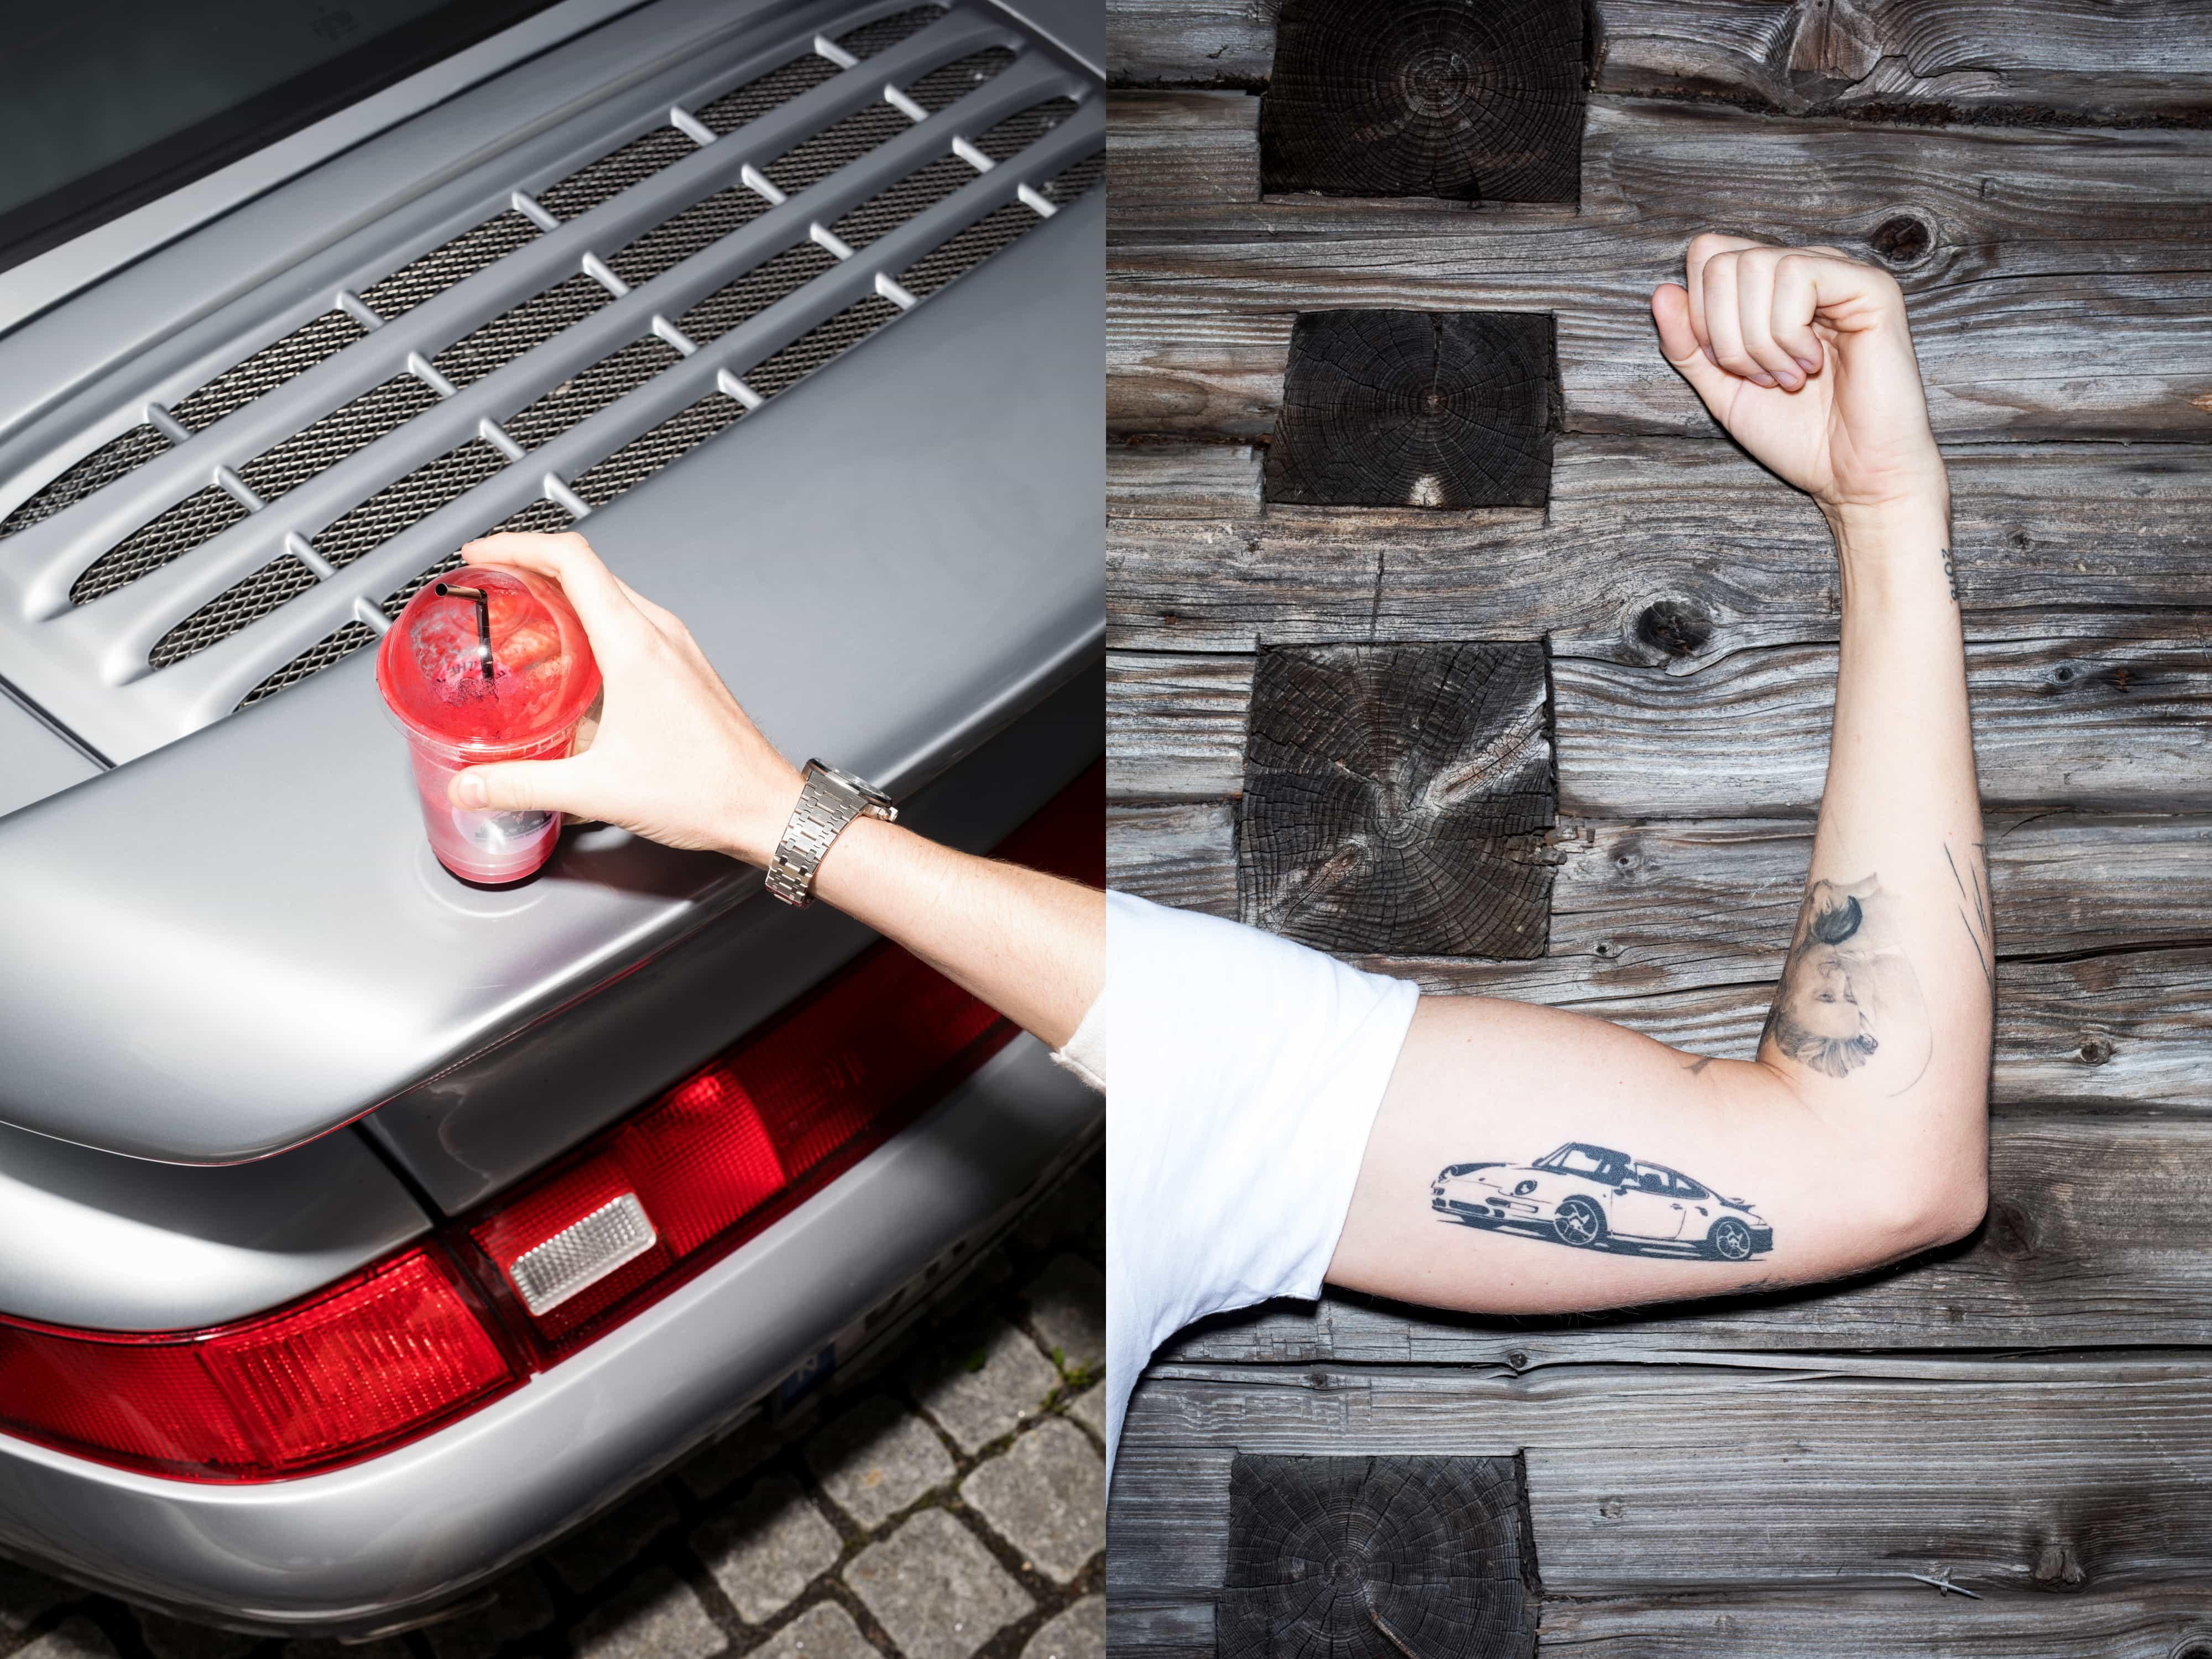 Kimm Saatvedt – Andreas Arnhoff + 993 for PORSCHE mag